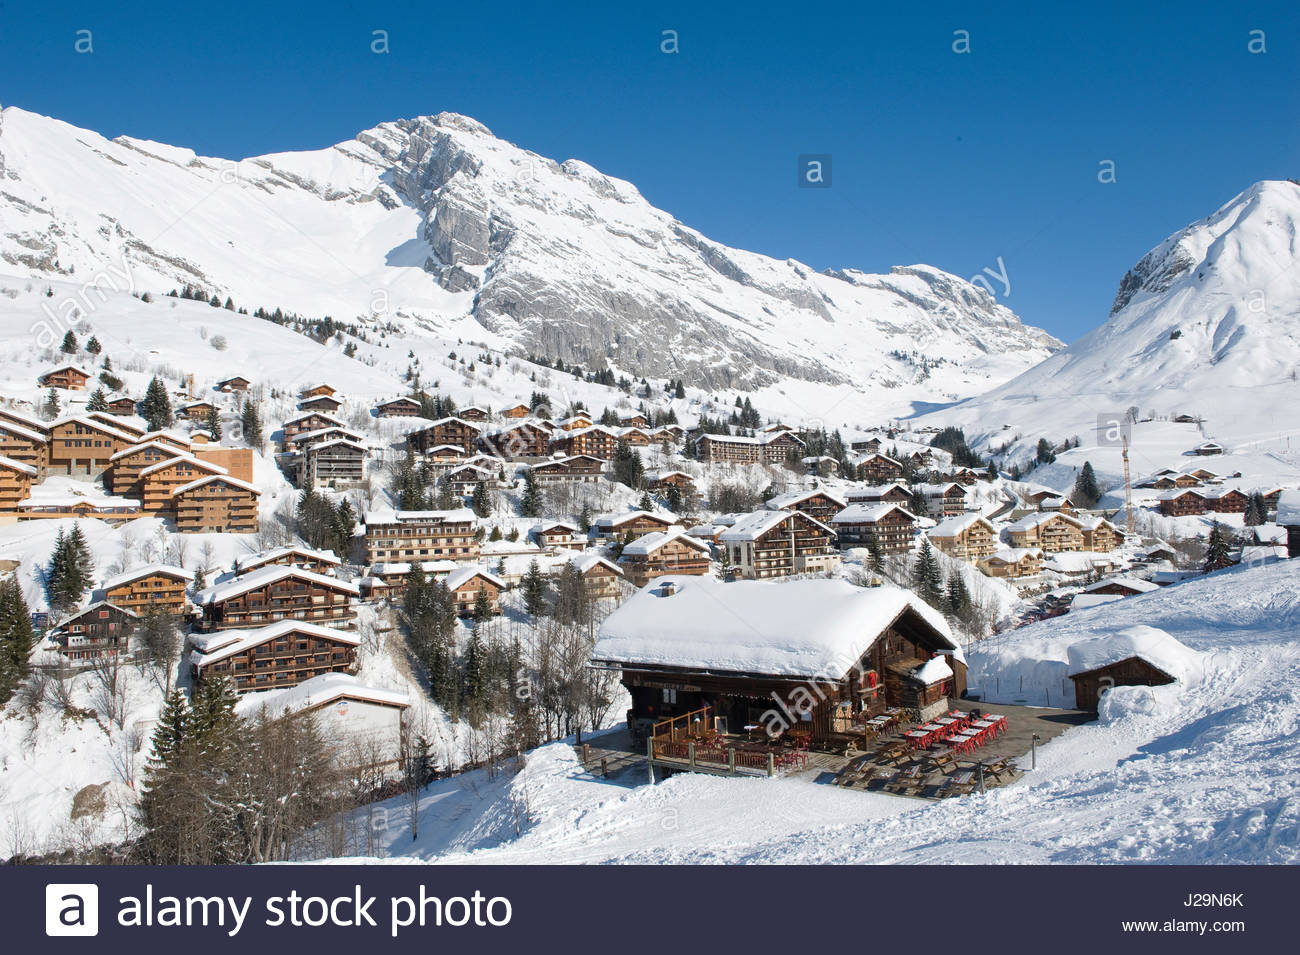 france, south-eastern france, le grand bornand, aravis massif, ski